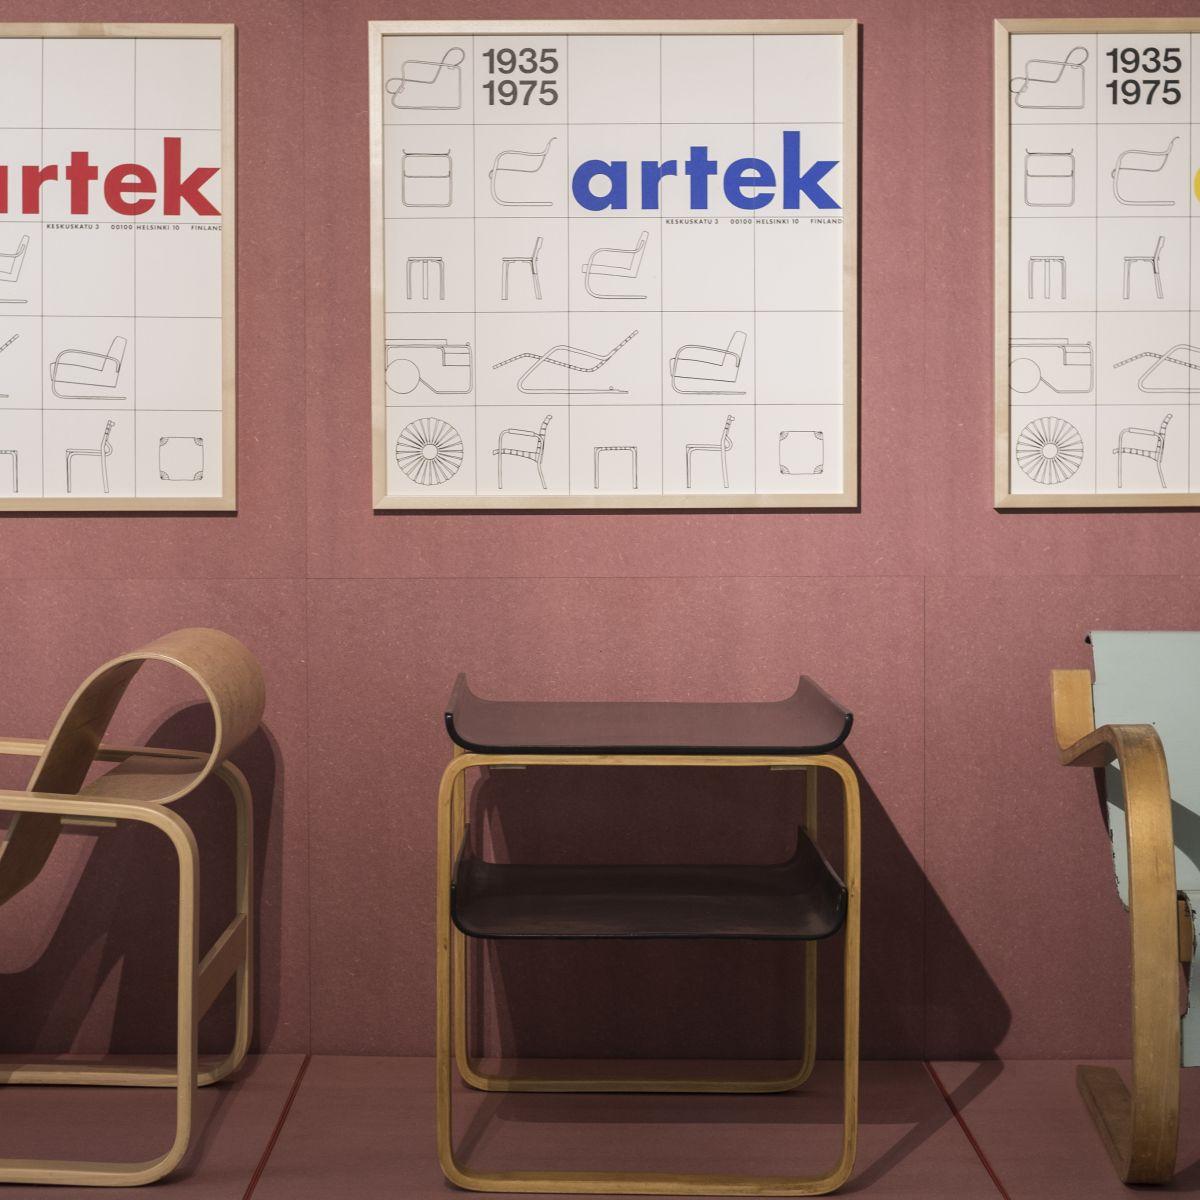 Artek_2Nd_Cycle_Exhibition_Photo_Andr-®_Demony_8-1885389